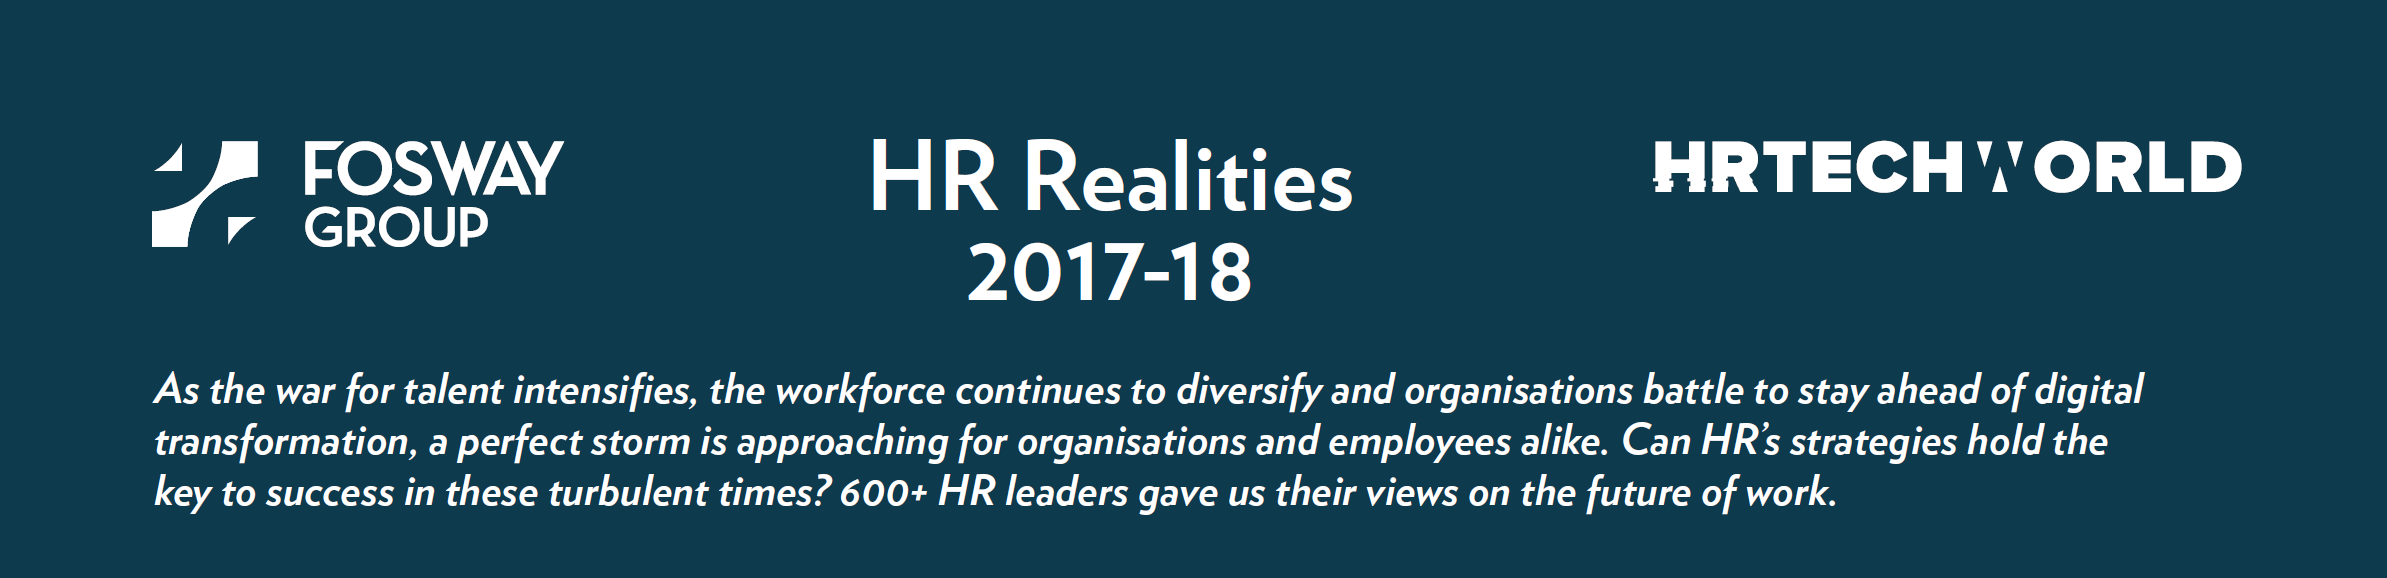 FOSWAY HR REALITIES HR TECH WORLD 2017-18